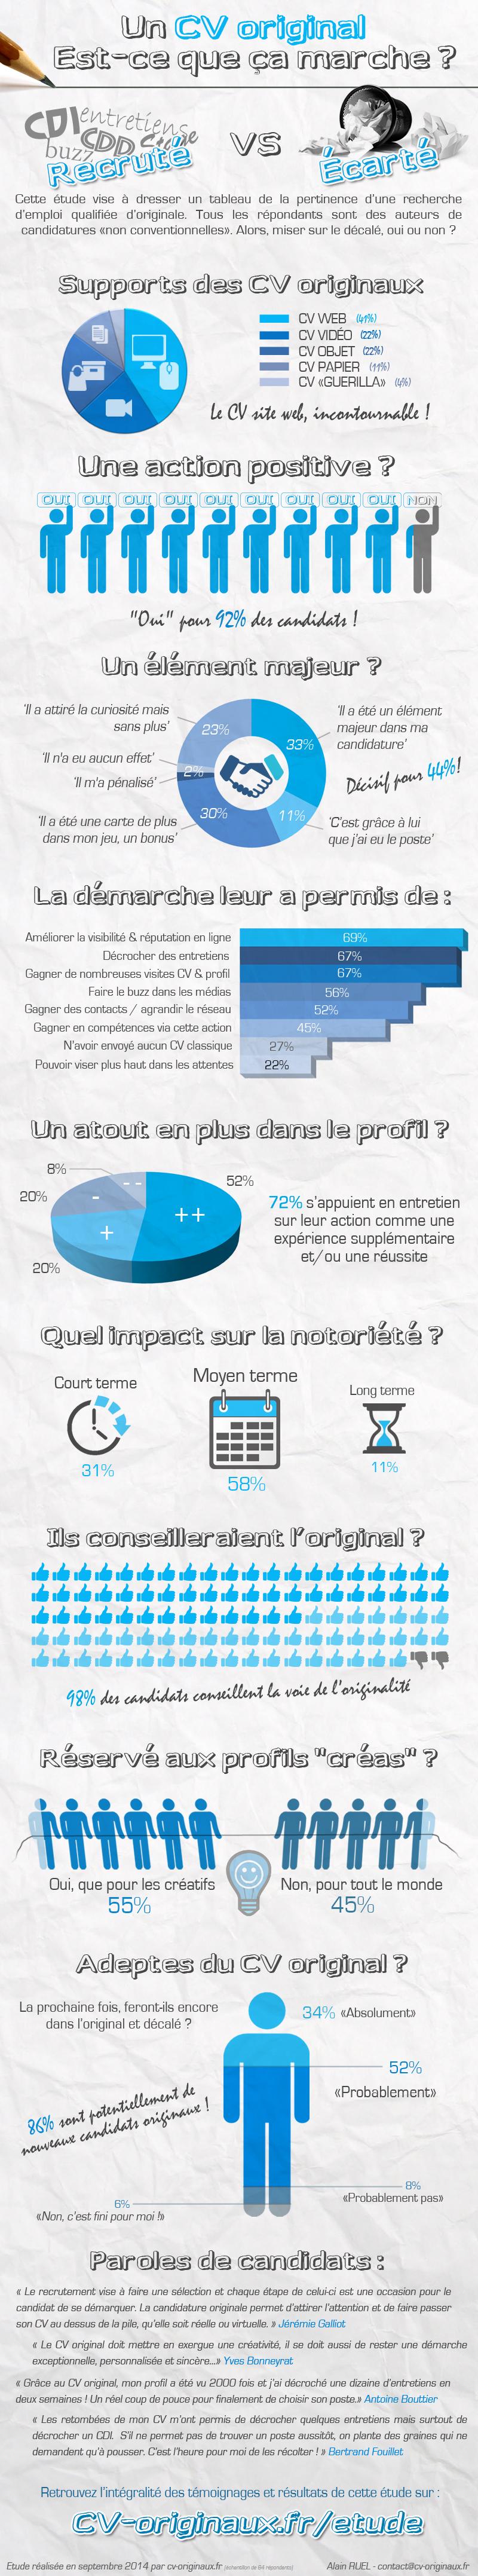 2014-10-23-infographie_etude_cv_originaux_original_canddiature_emploi.jpg